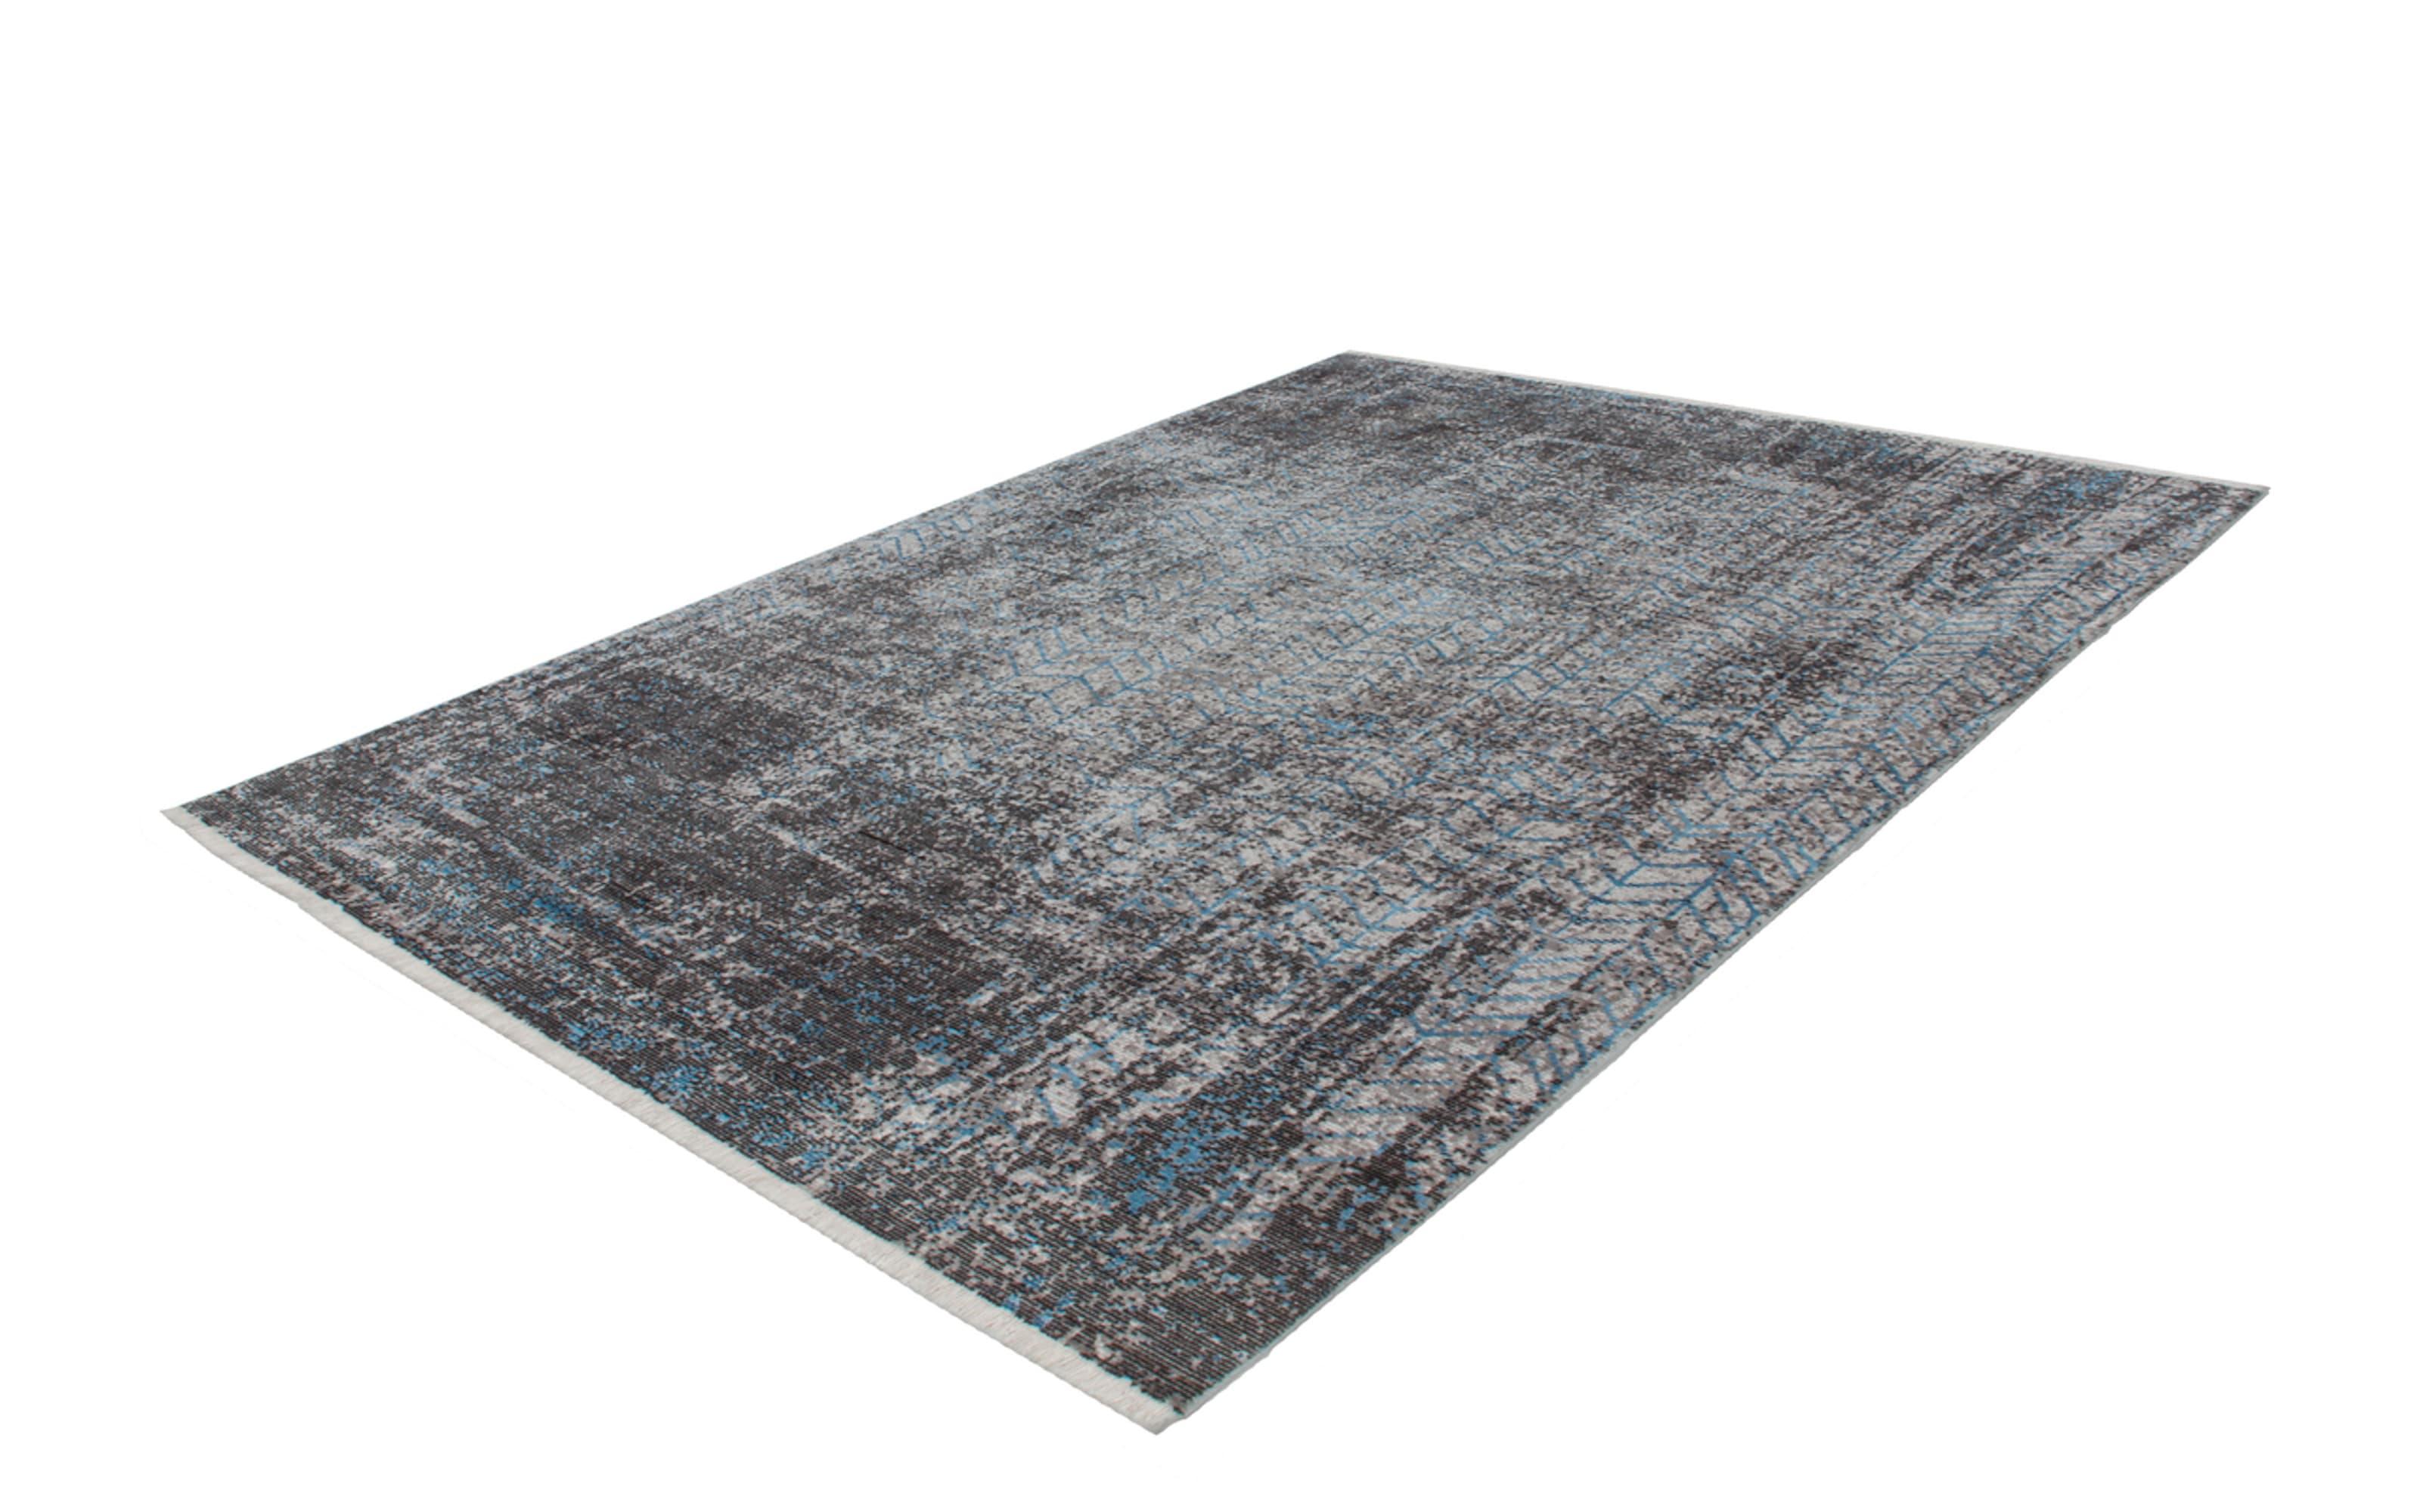 Teppich Antigua 300 in grau-türkis, 120 x 170 cm